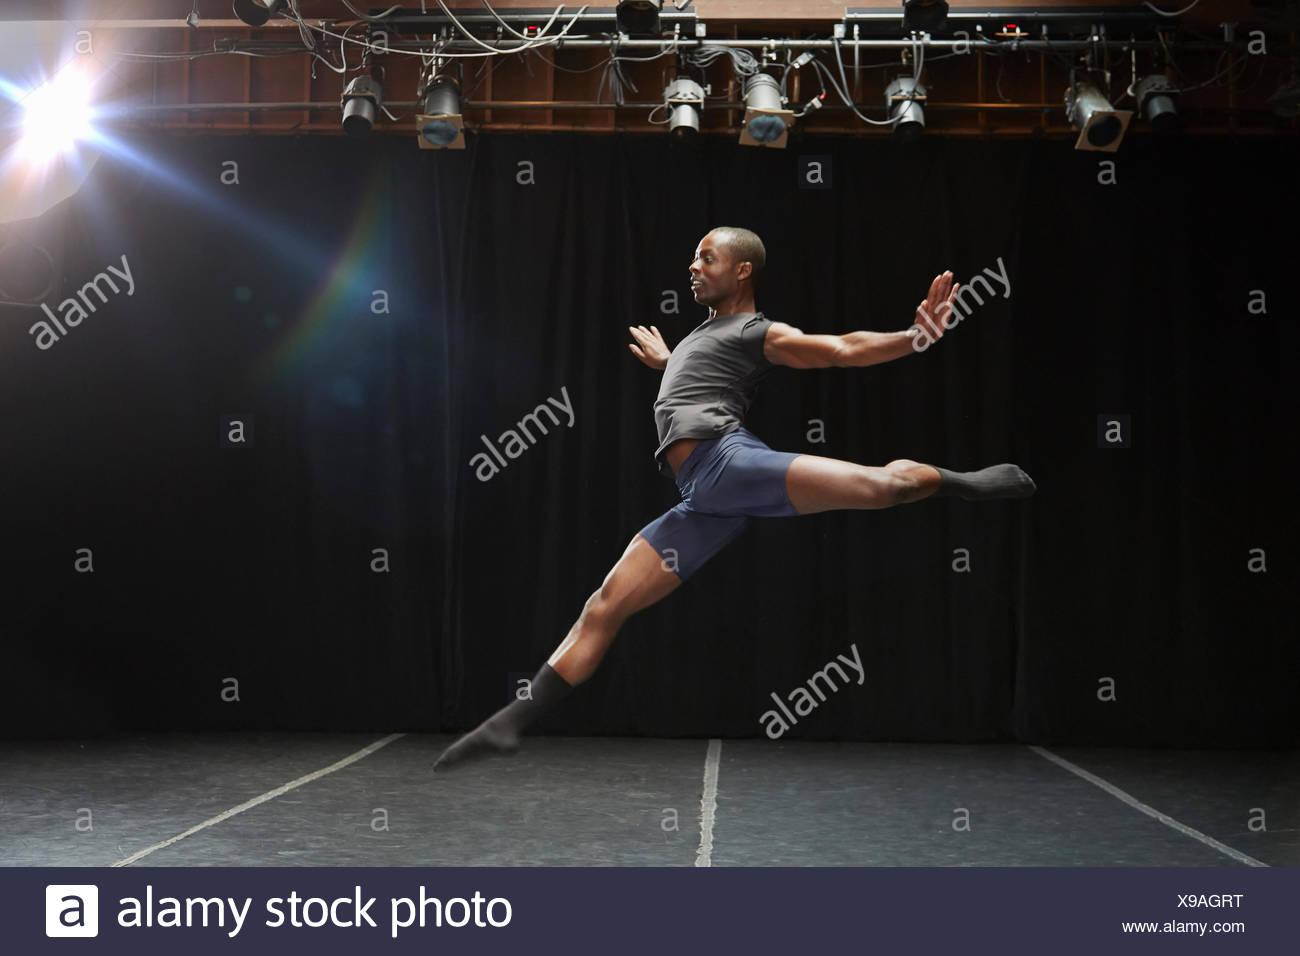 Dancer in midair pose Stock Photo